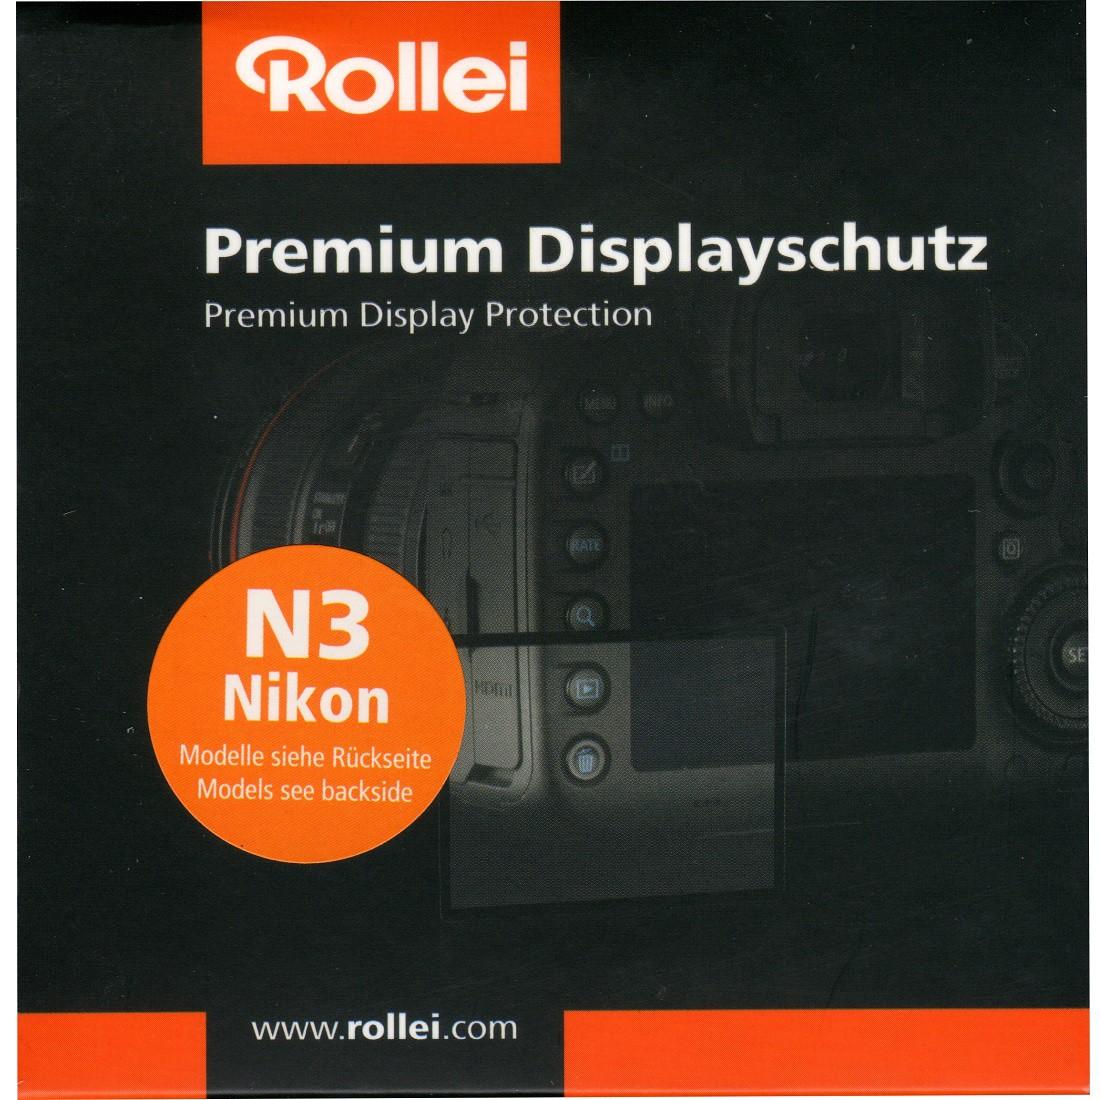 Rollei Premium Displayschutz N3 Nikon D3200, D3300